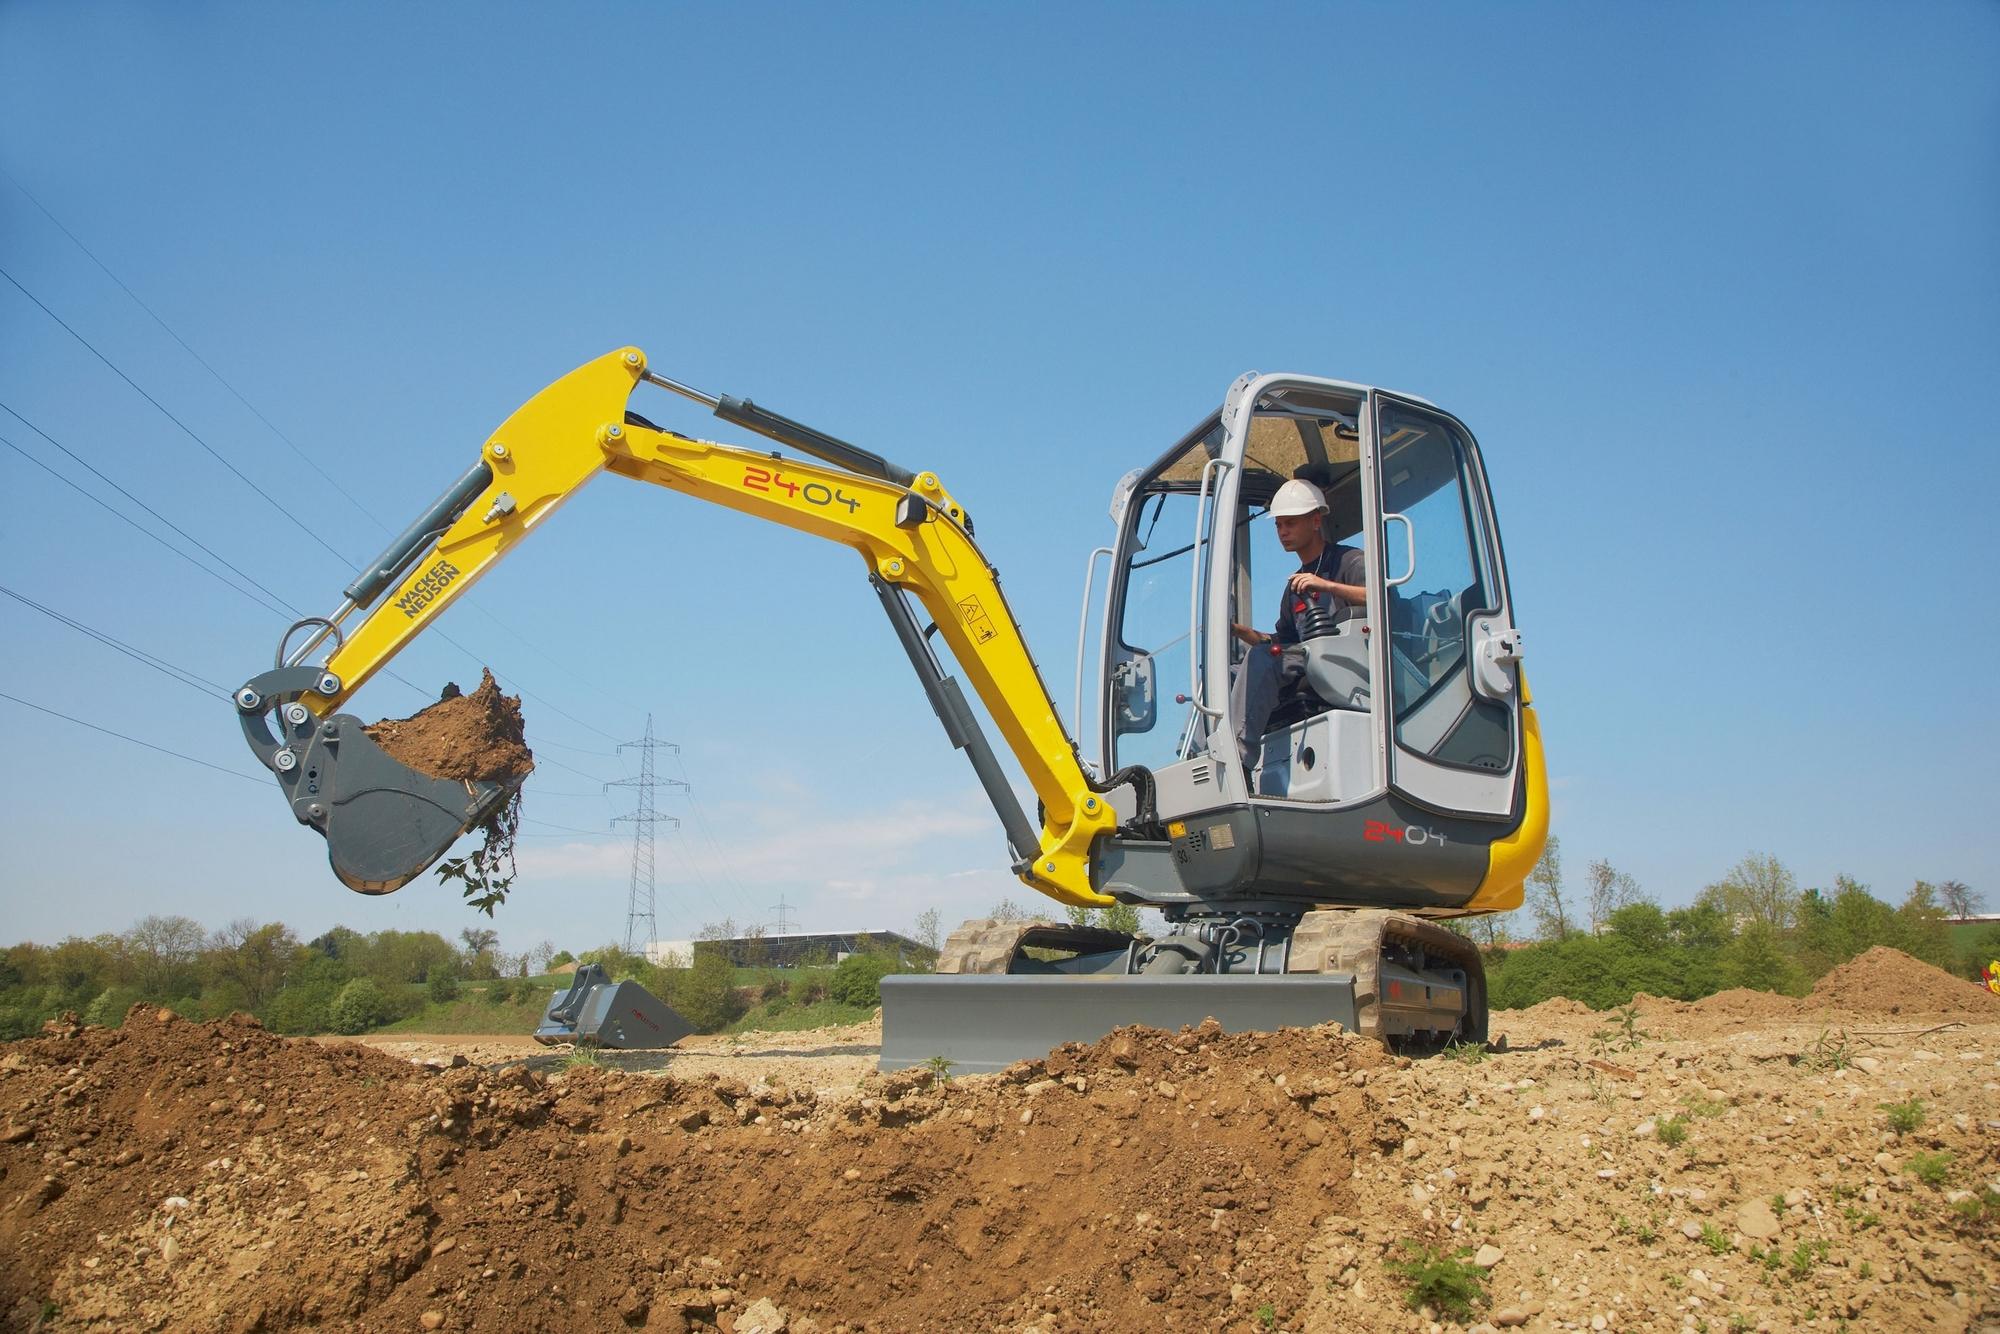 Wacker Neuson introduces new compact excavator - Construction News